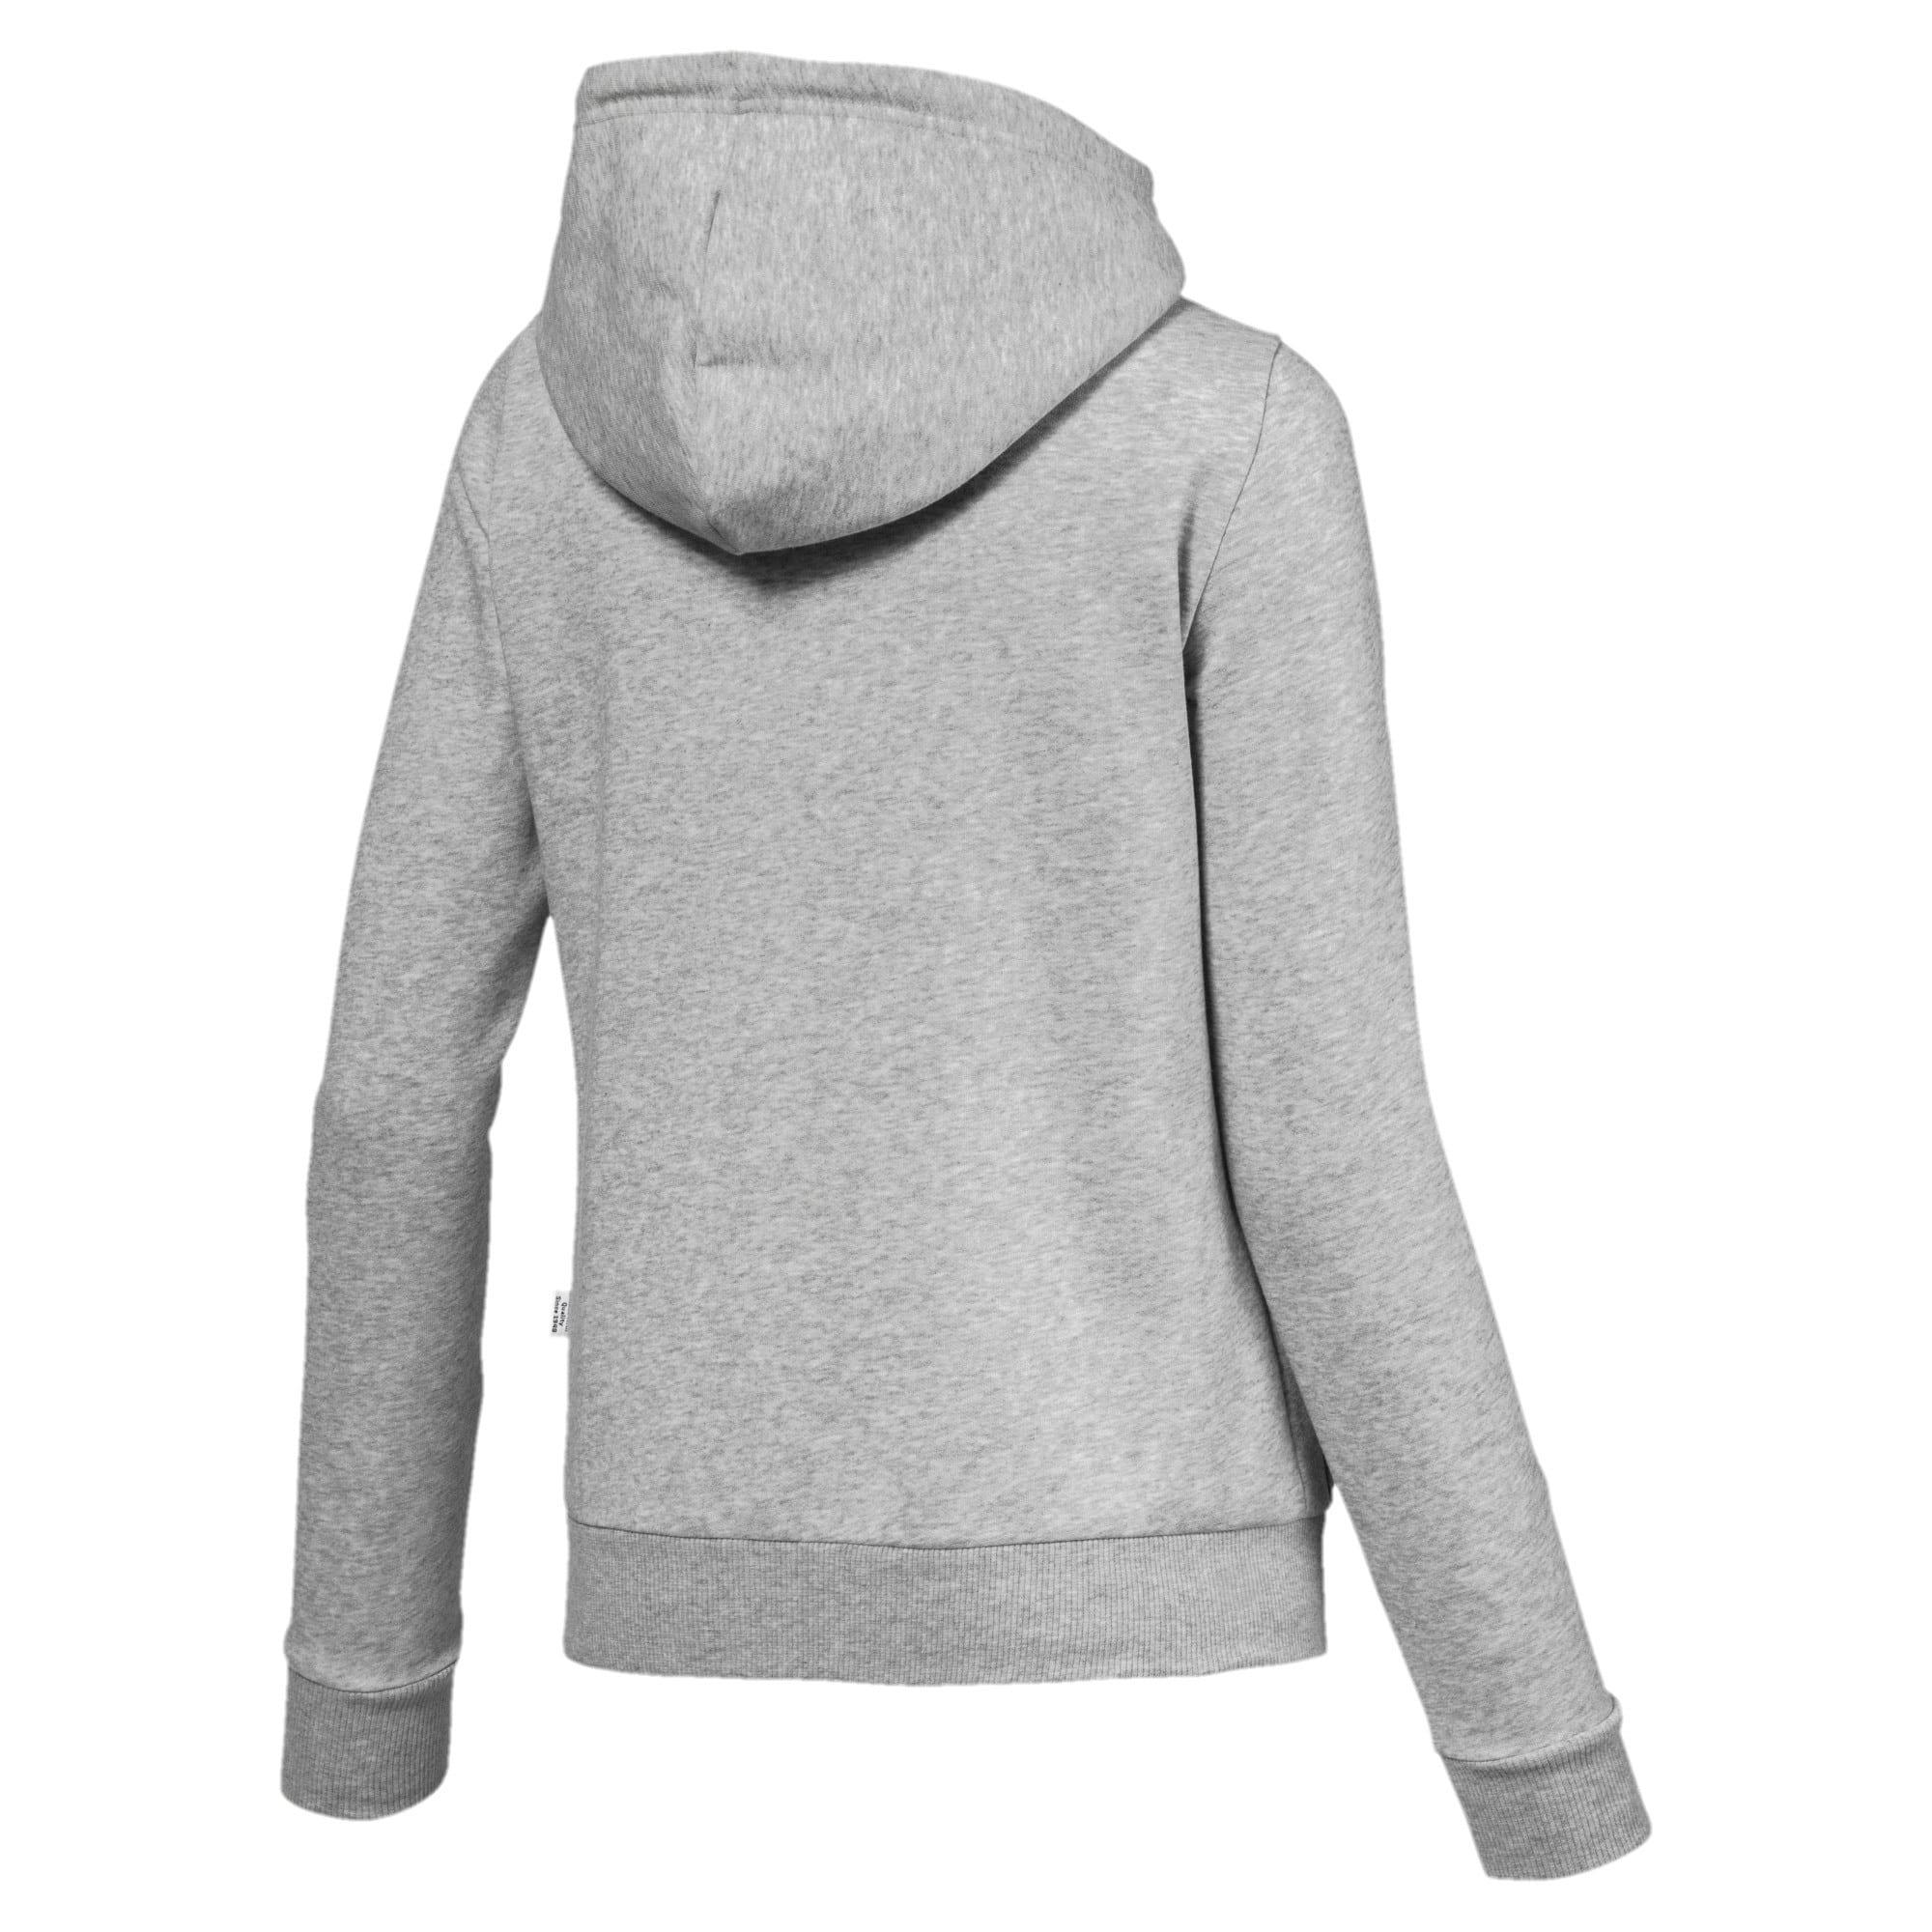 Thumbnail 2 of Essentials Fleece Hooded Full Zip Women's Sweat Jacket, Light Gray Heather, medium